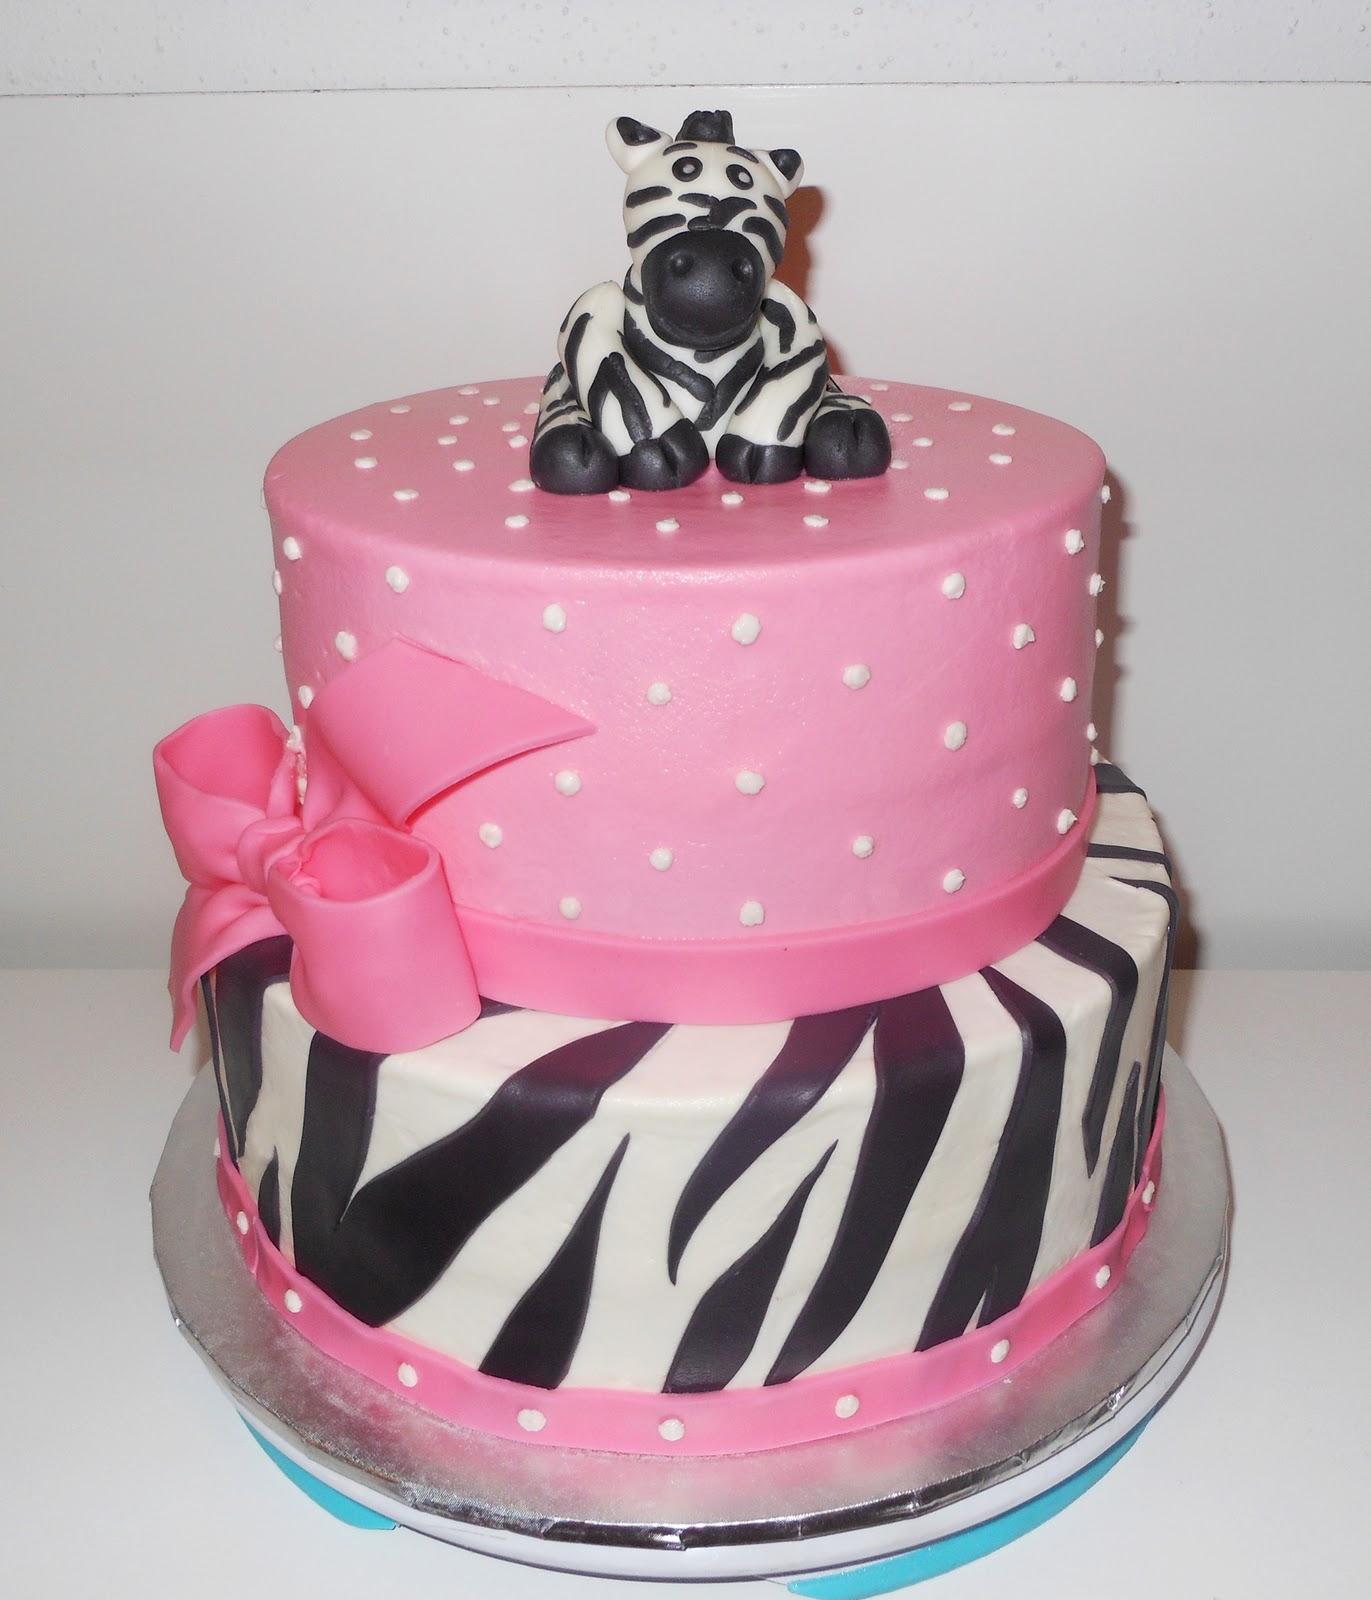 Terrific Zebra Cakes Decoration Ideas Little Birthday Cakes Funny Birthday Cards Online Sheoxdamsfinfo